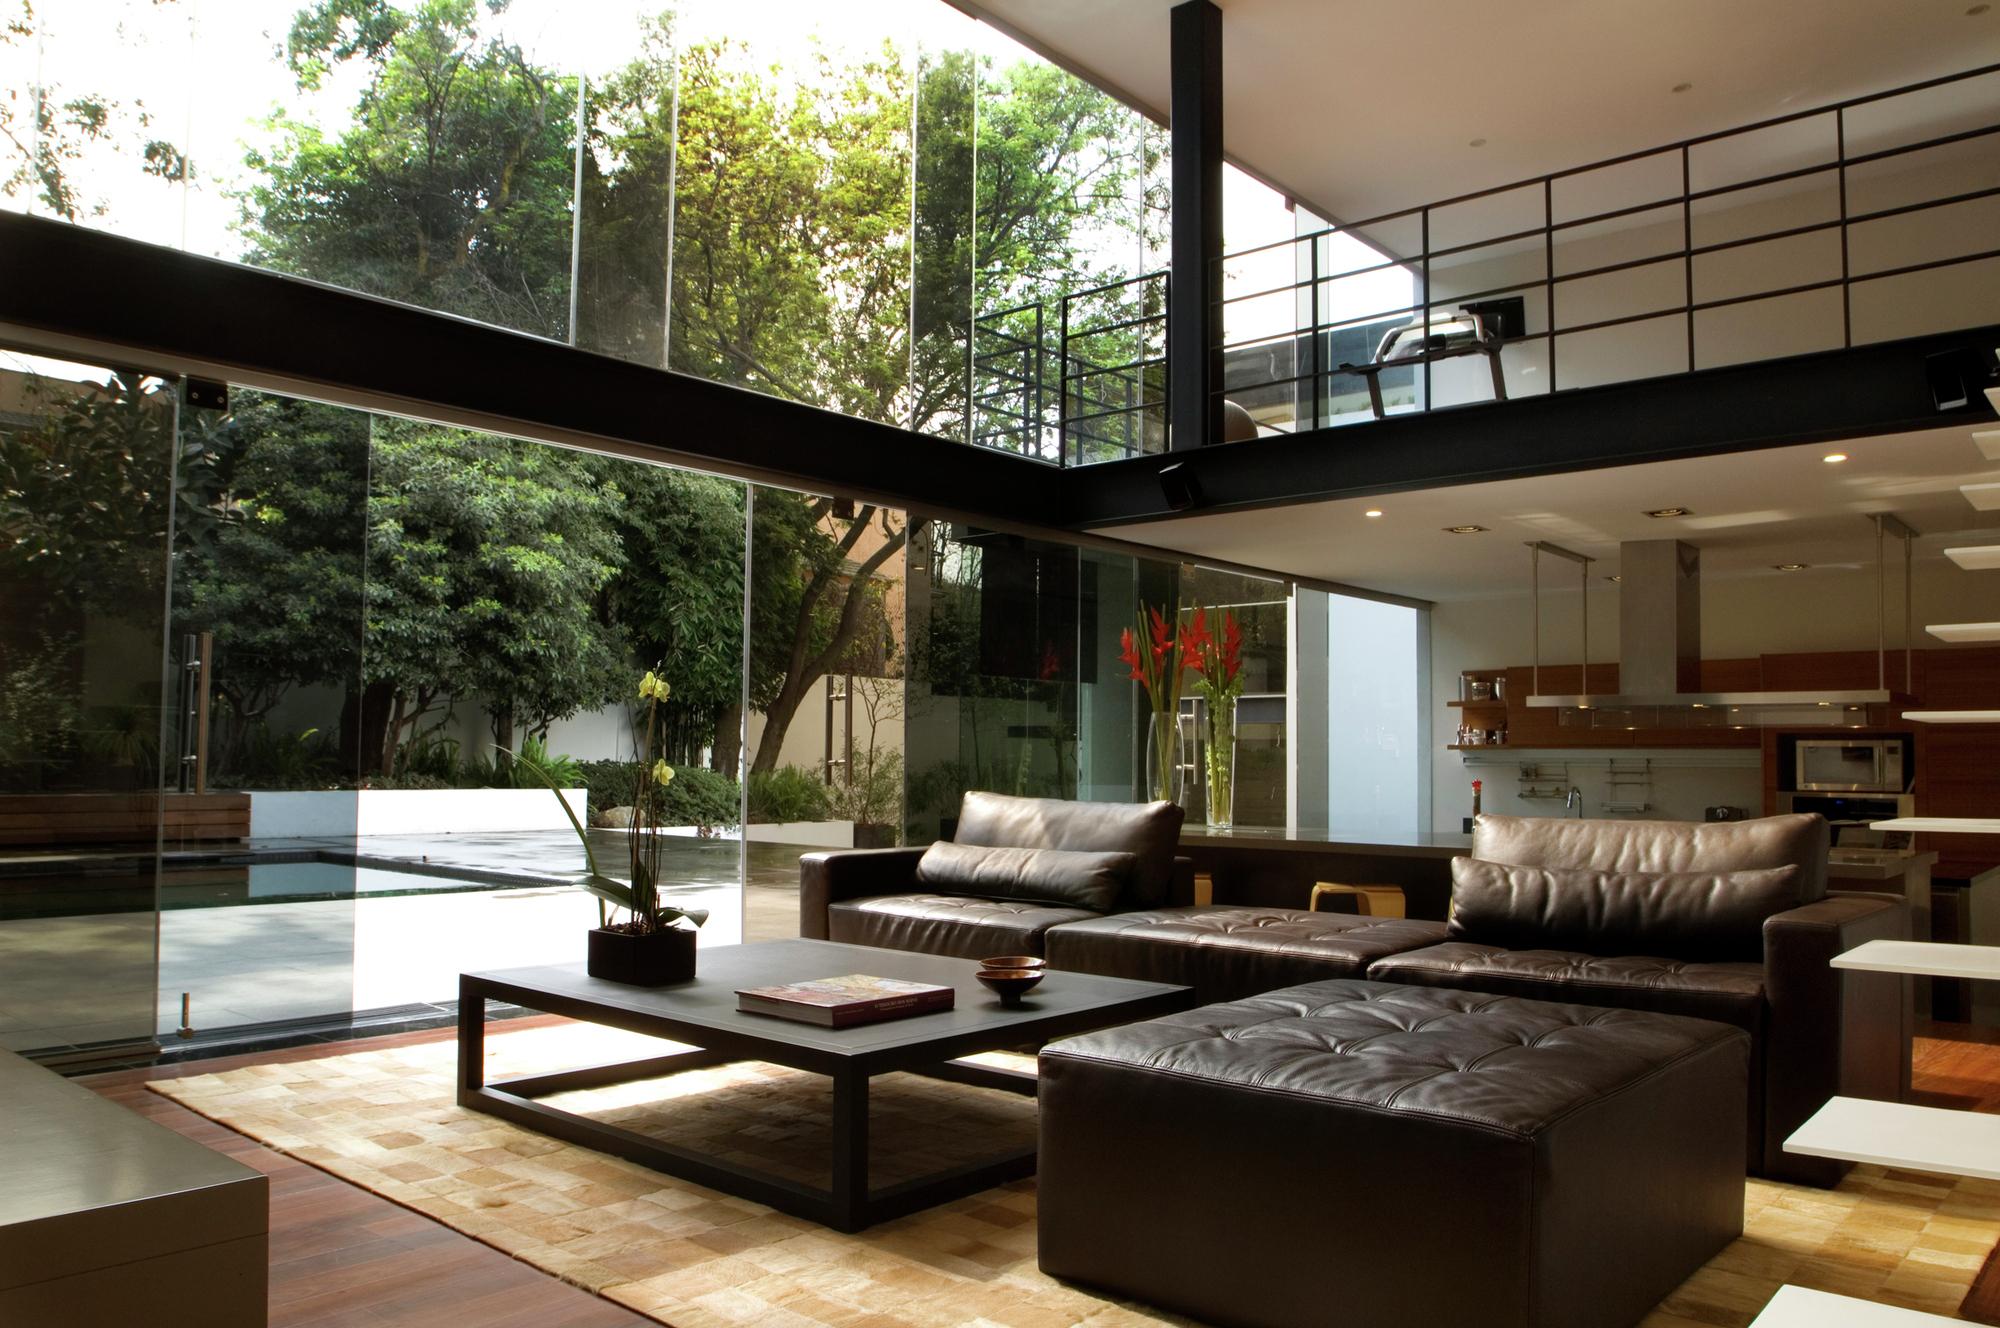 Casa lomas de chapultepec paola calzada arquitectos for Casa lomas muebles